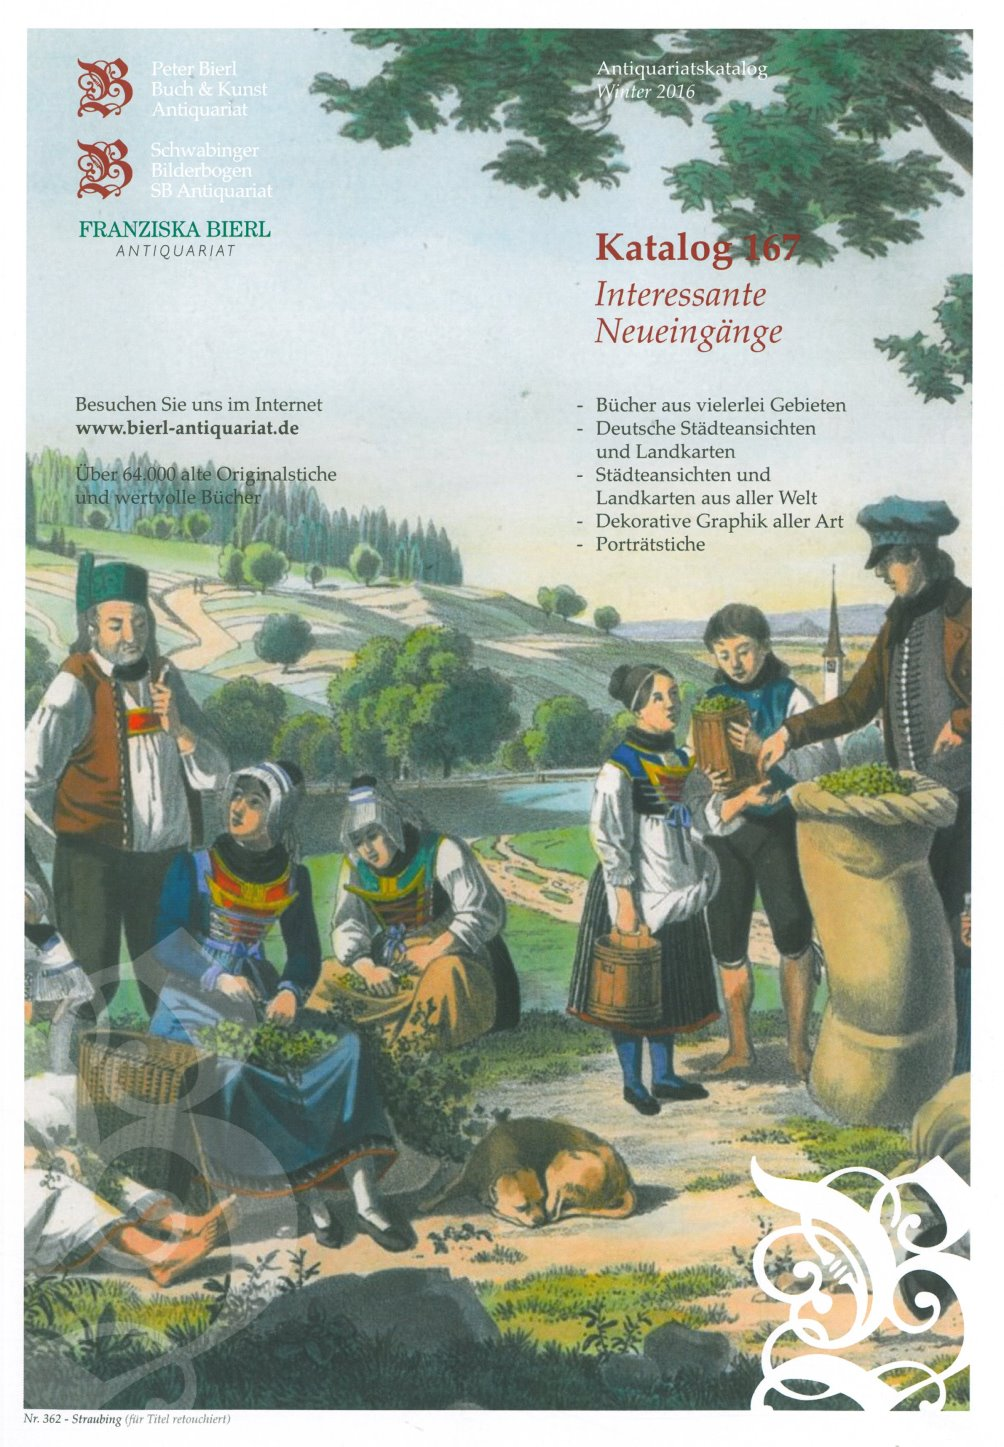 Katalog 167 - Interessante Neueingänge